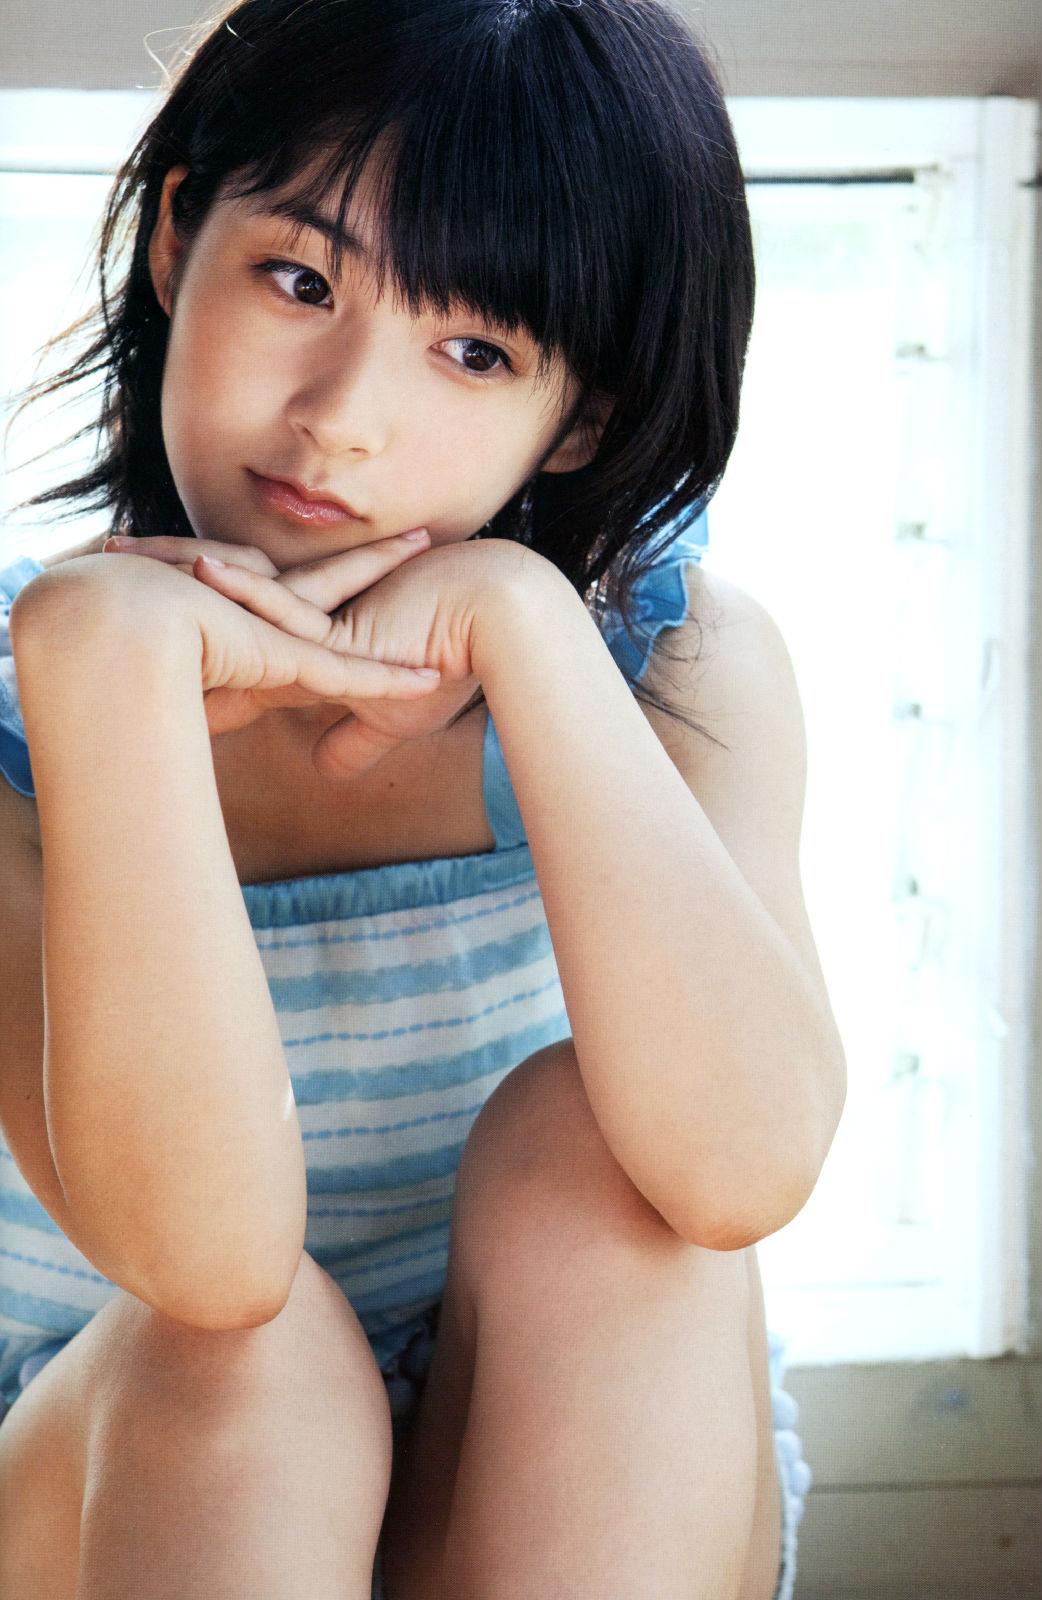 Berryz Koubou (Berryz工房), Country Girls (カントリー・ガールズ), Photobook, Tsugunaga Momoko (嗣永桃子)